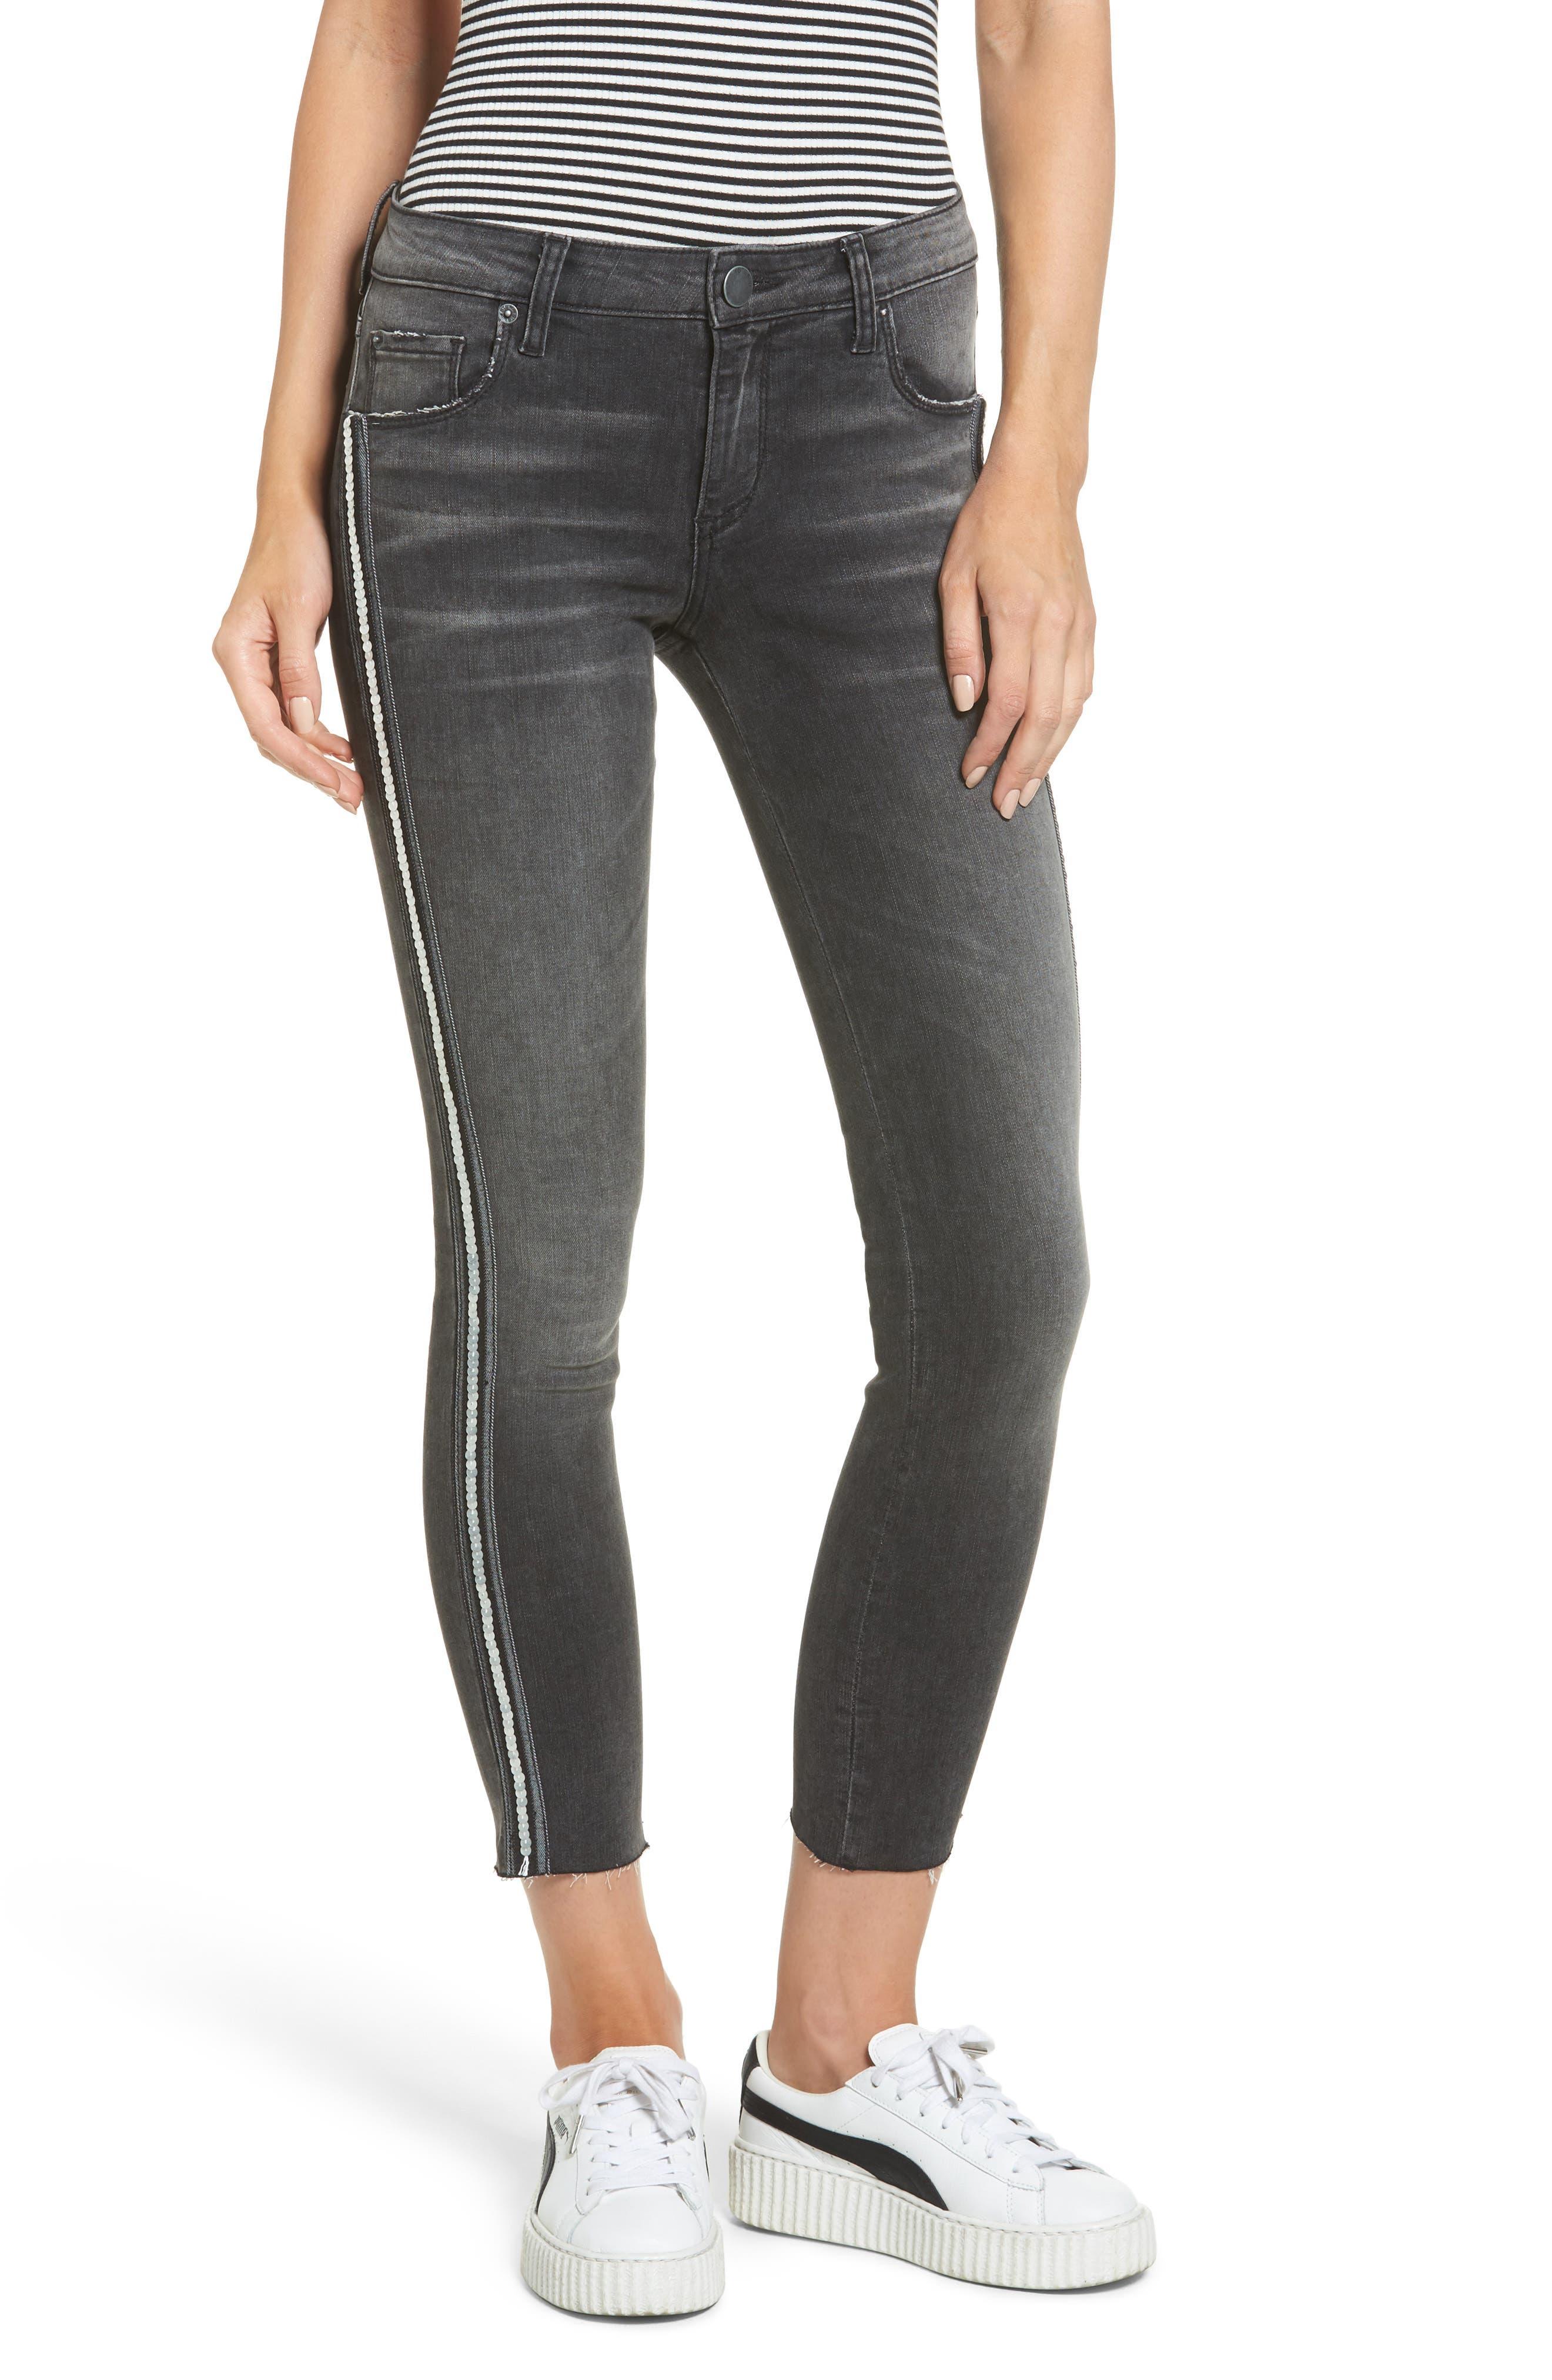 Alternate Image 1 Selected - STS Blue Tuxedo Stripe Skinny Jeans